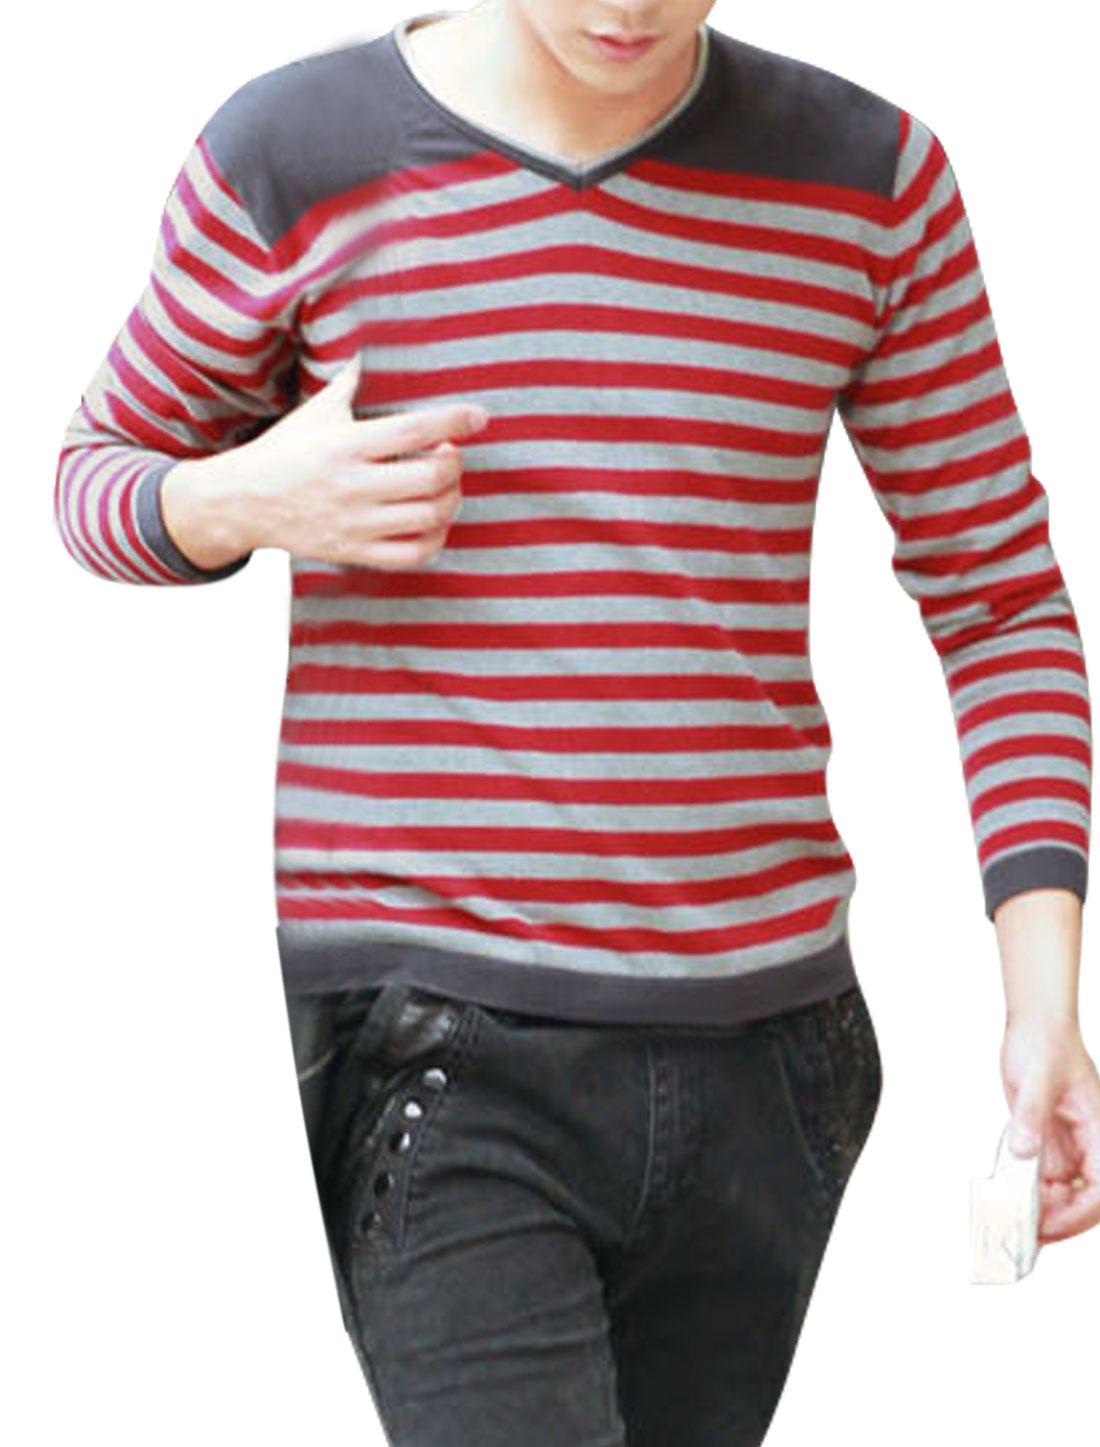 Men V Neckline Design Long Sleeve Casual Knitted Shirt Red Gray M